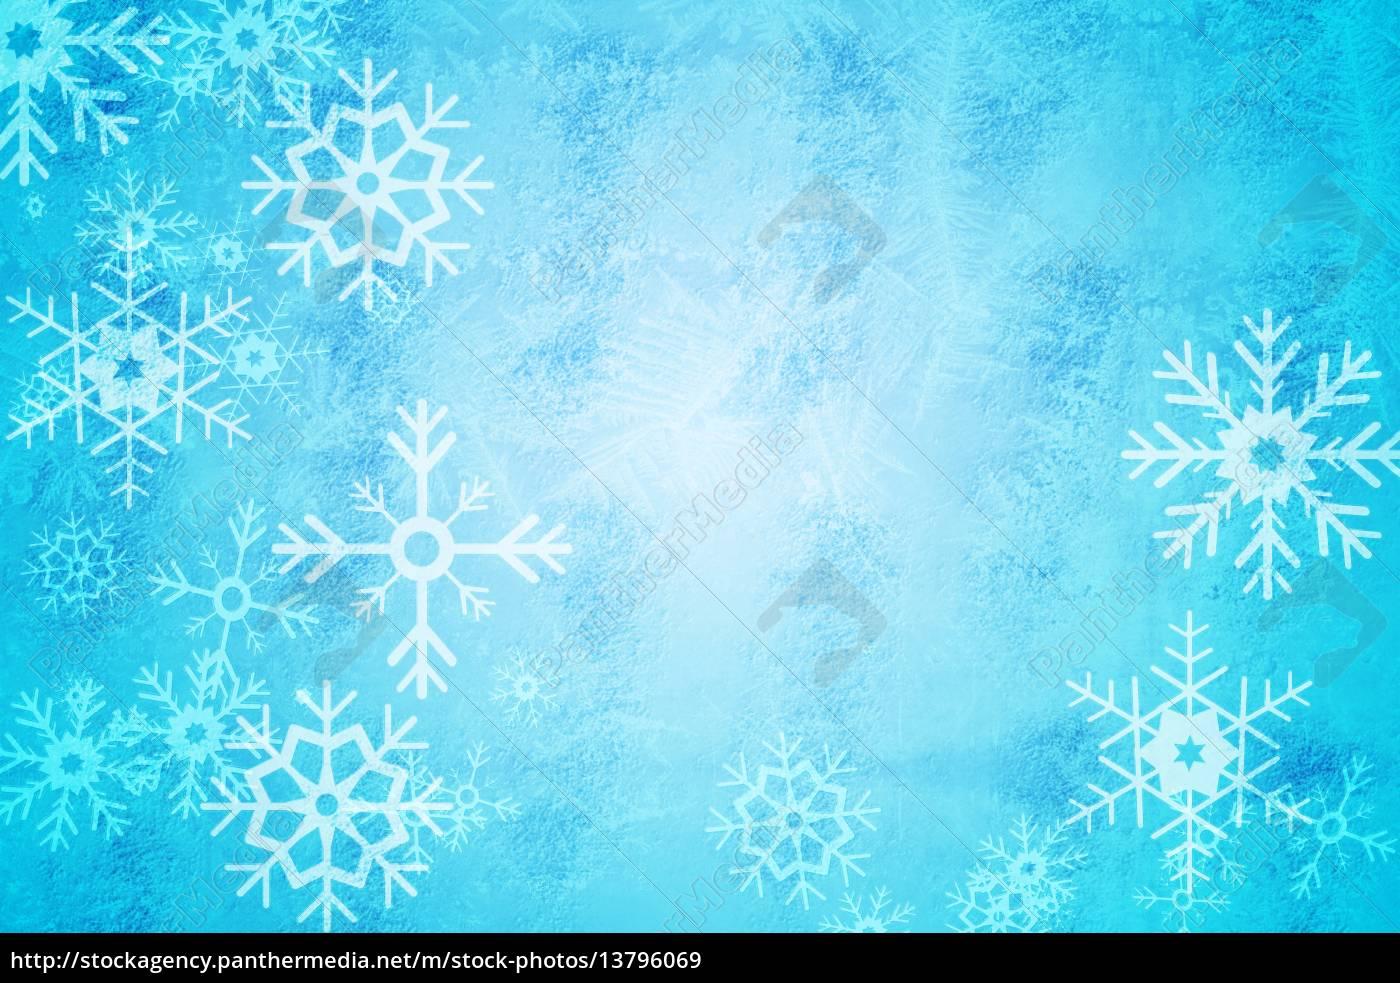 blue, snow, flake, pattern, design - 13796069